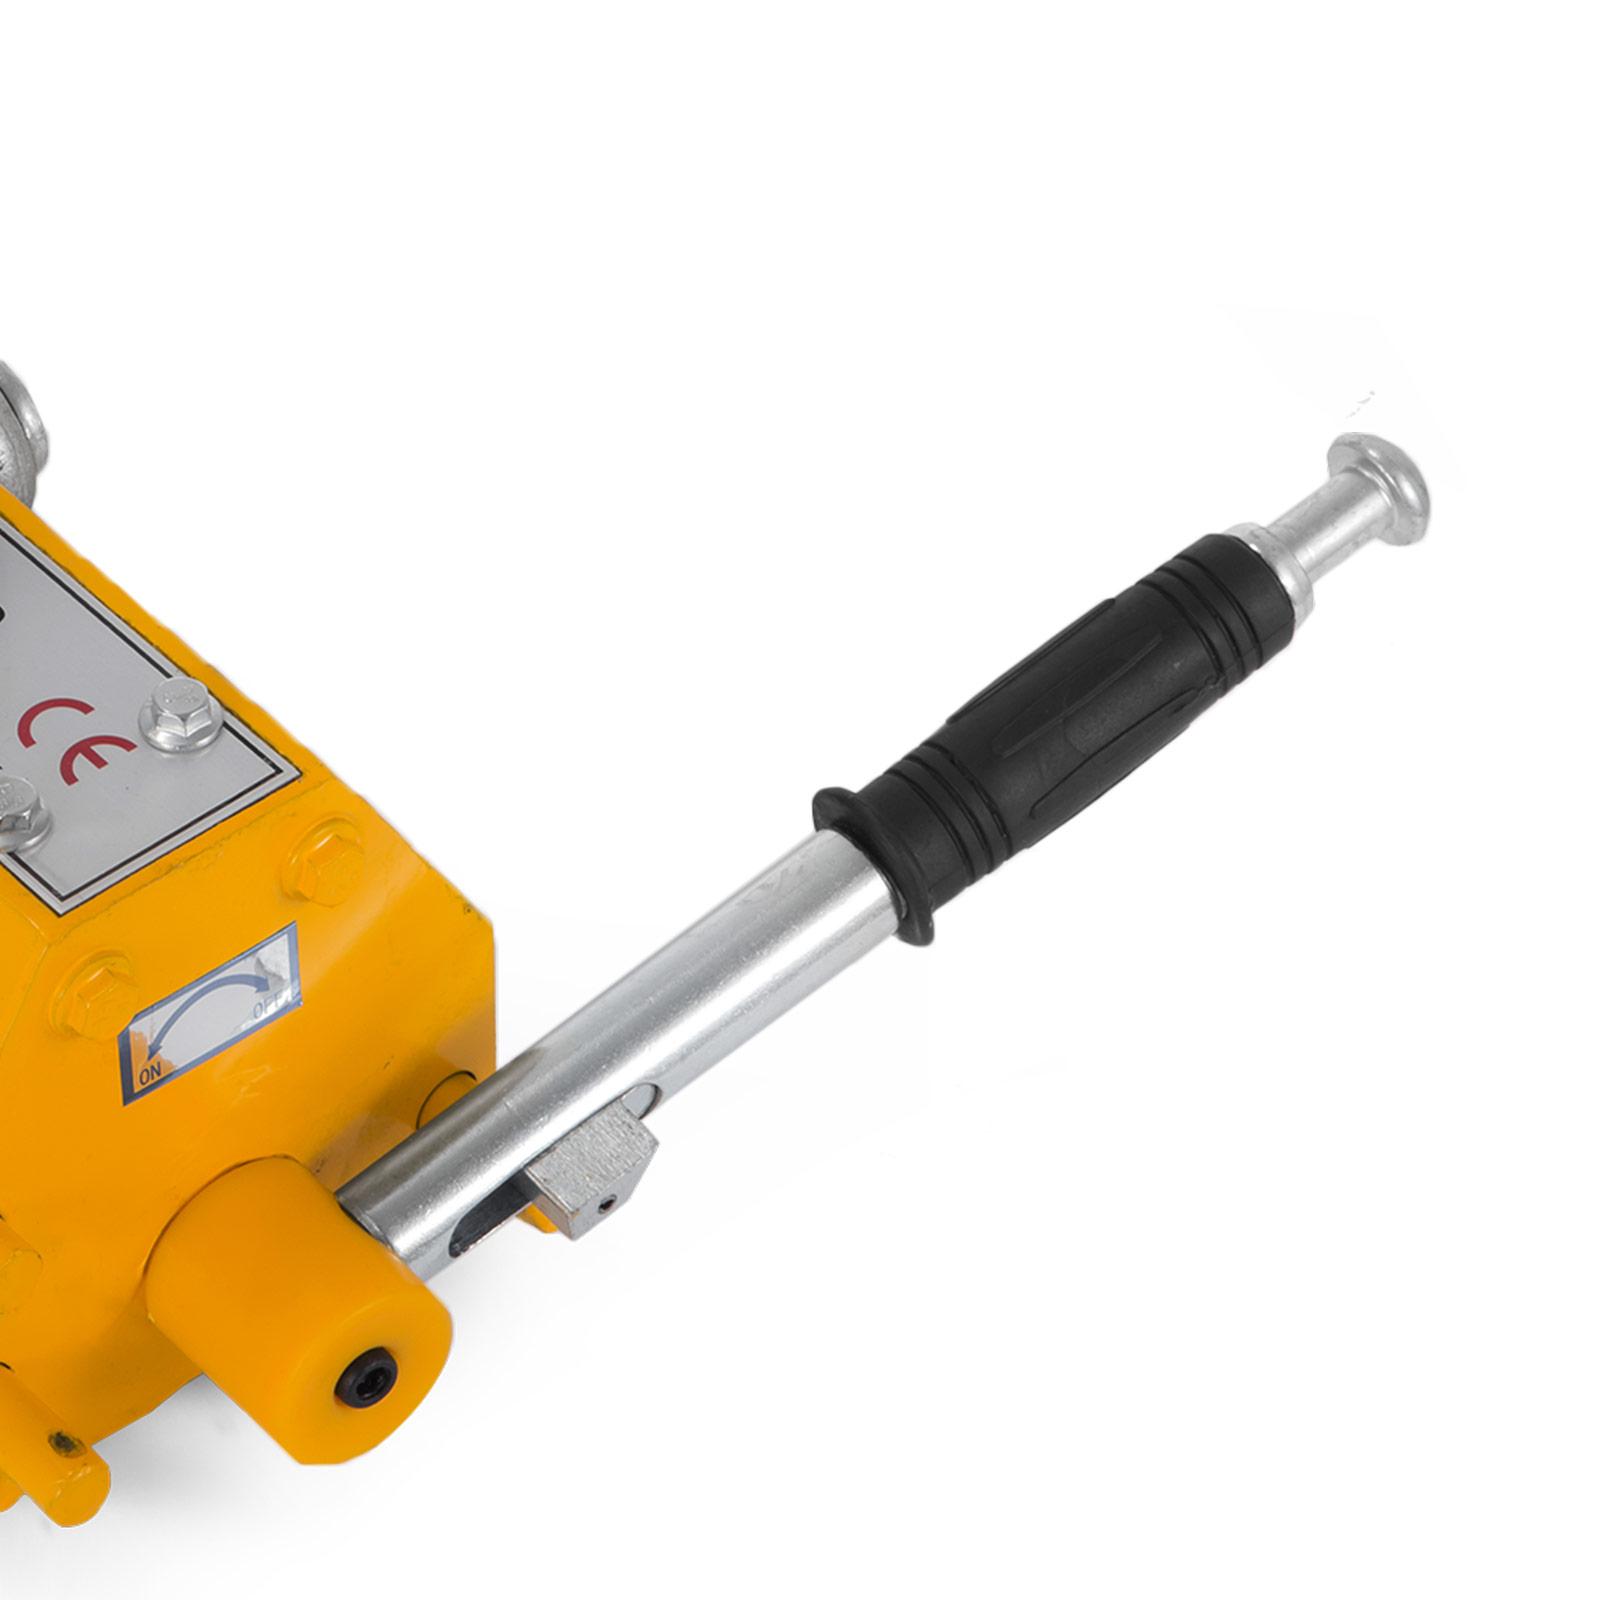 100-300-600-1000KG-Steel-Magnetic-Lifter-Heavy-Duty-Crane-Hoist-Lifting-Magnet miniature 72